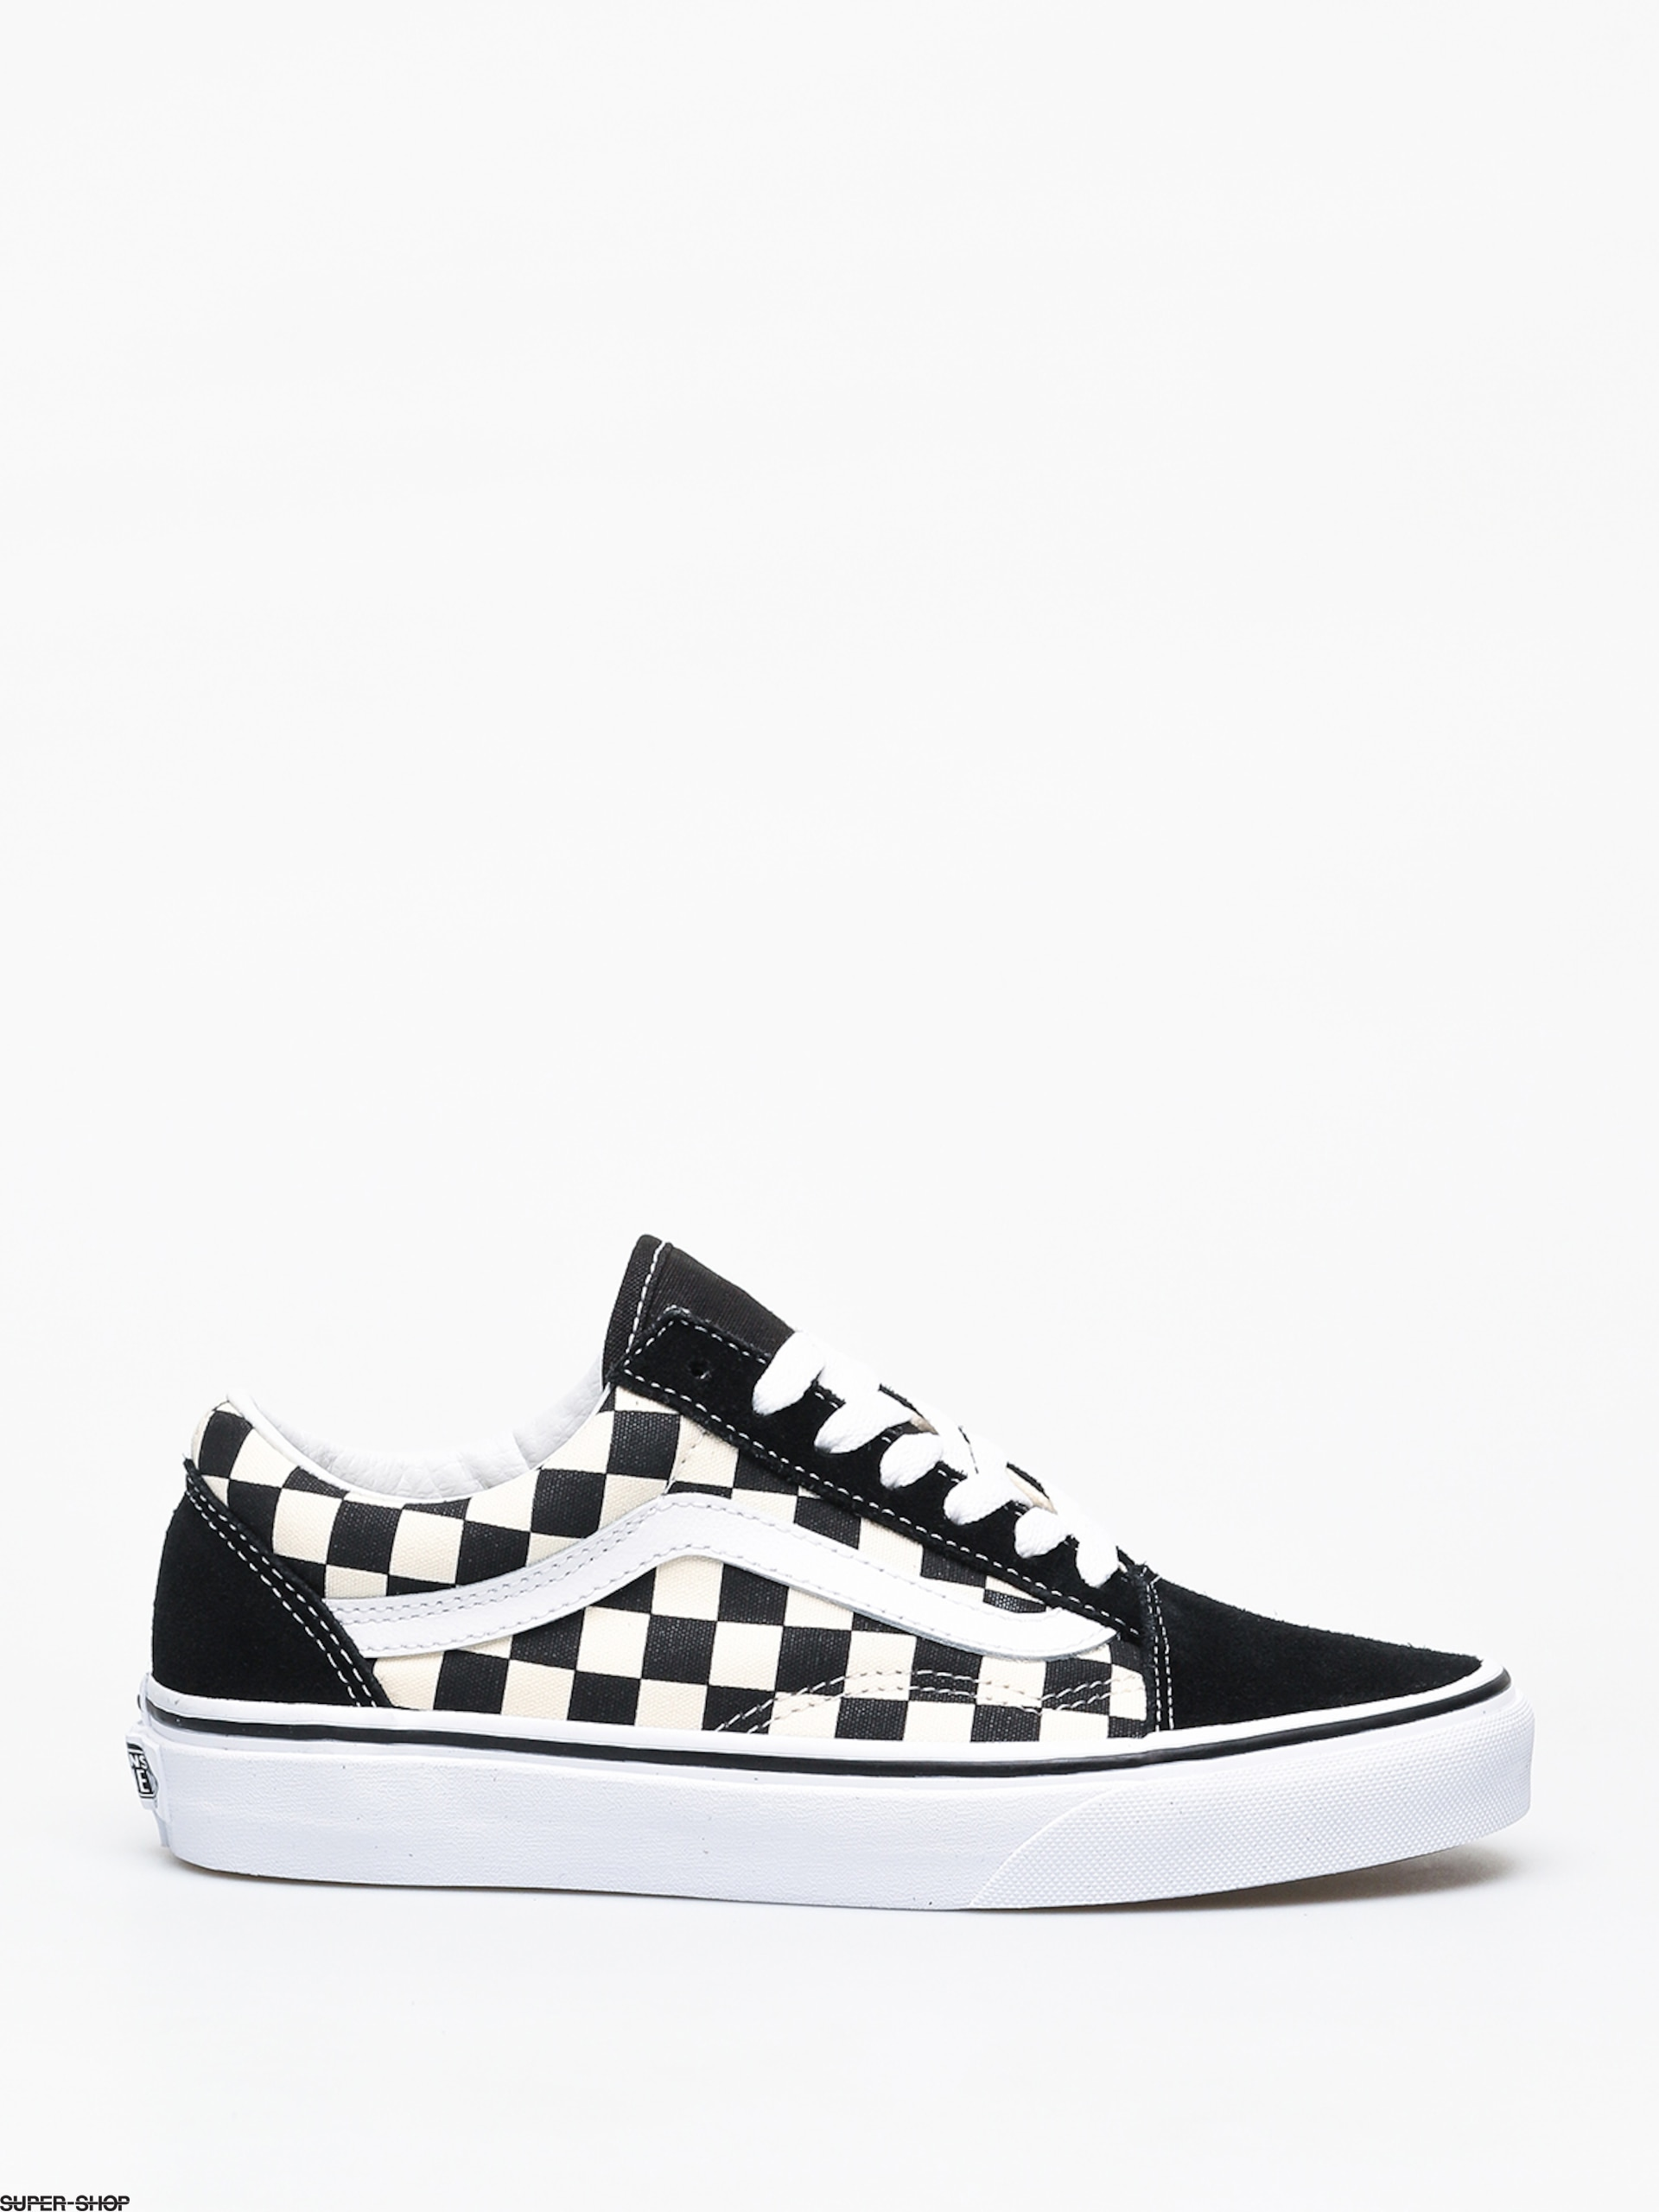 Vans Old Skool Shoes (primary check)